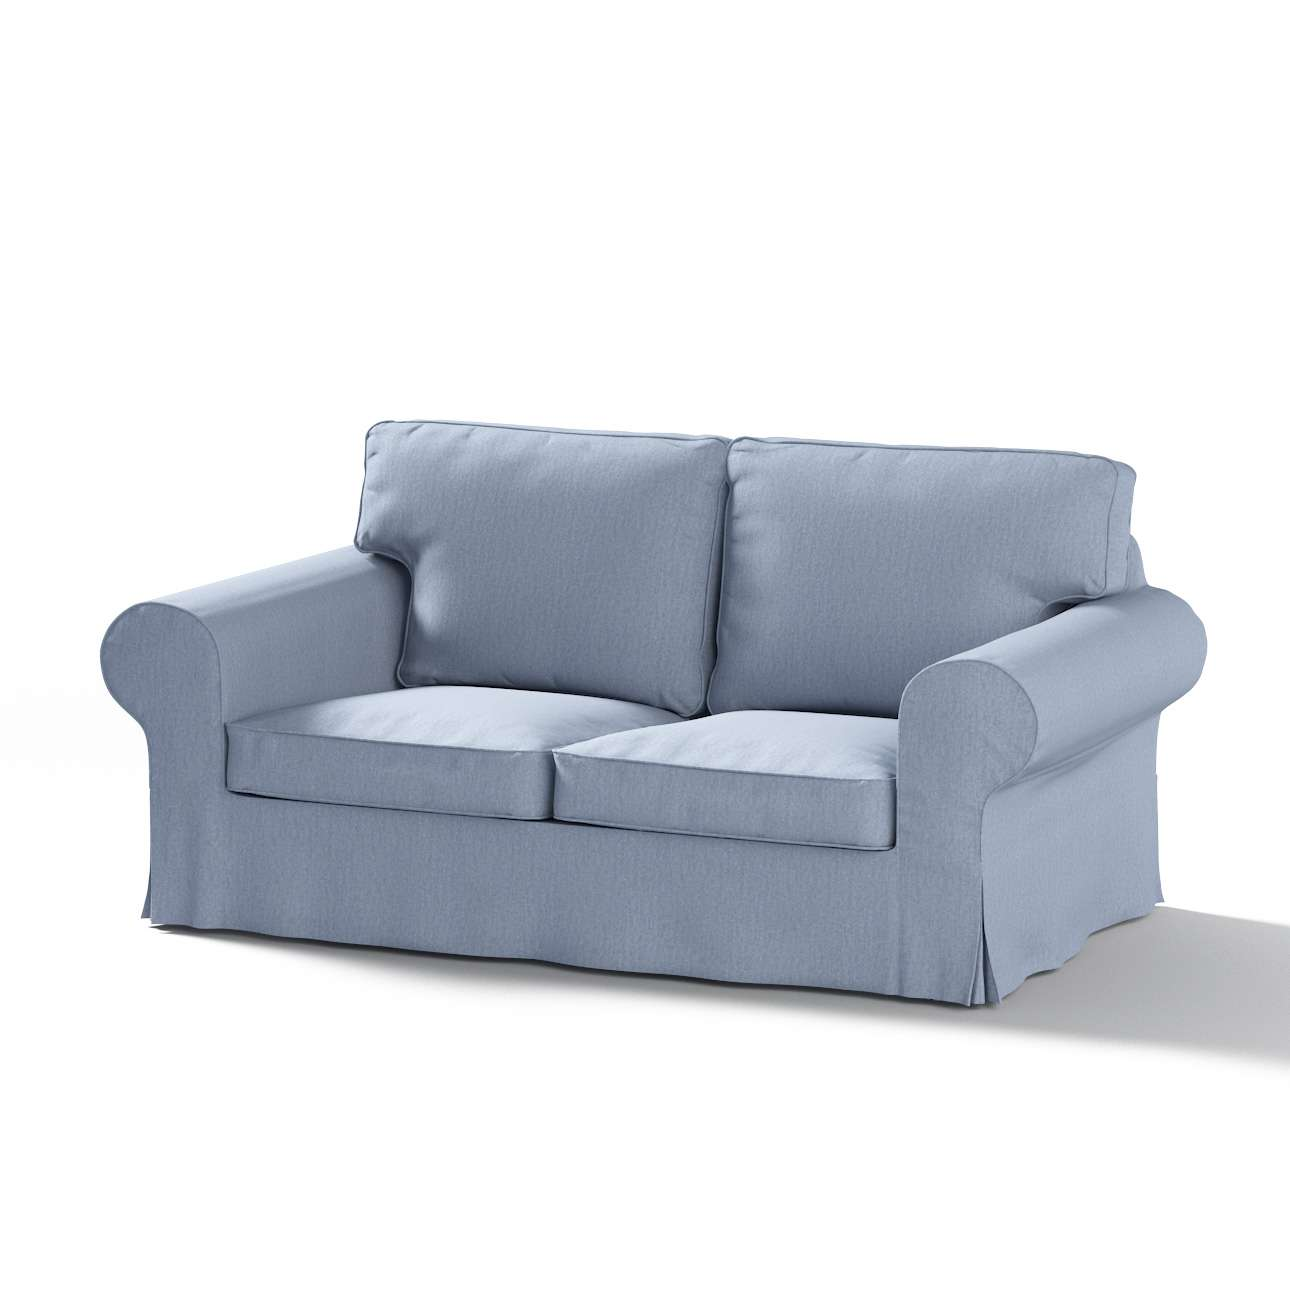 Ektorp 2-Sitzer Schlafsofabezug ALTES Modell Sofabezug Ektorp 2-Sitzer Schlafsofa altes Modell von der Kollektion Chenille , Stoff: 702-13